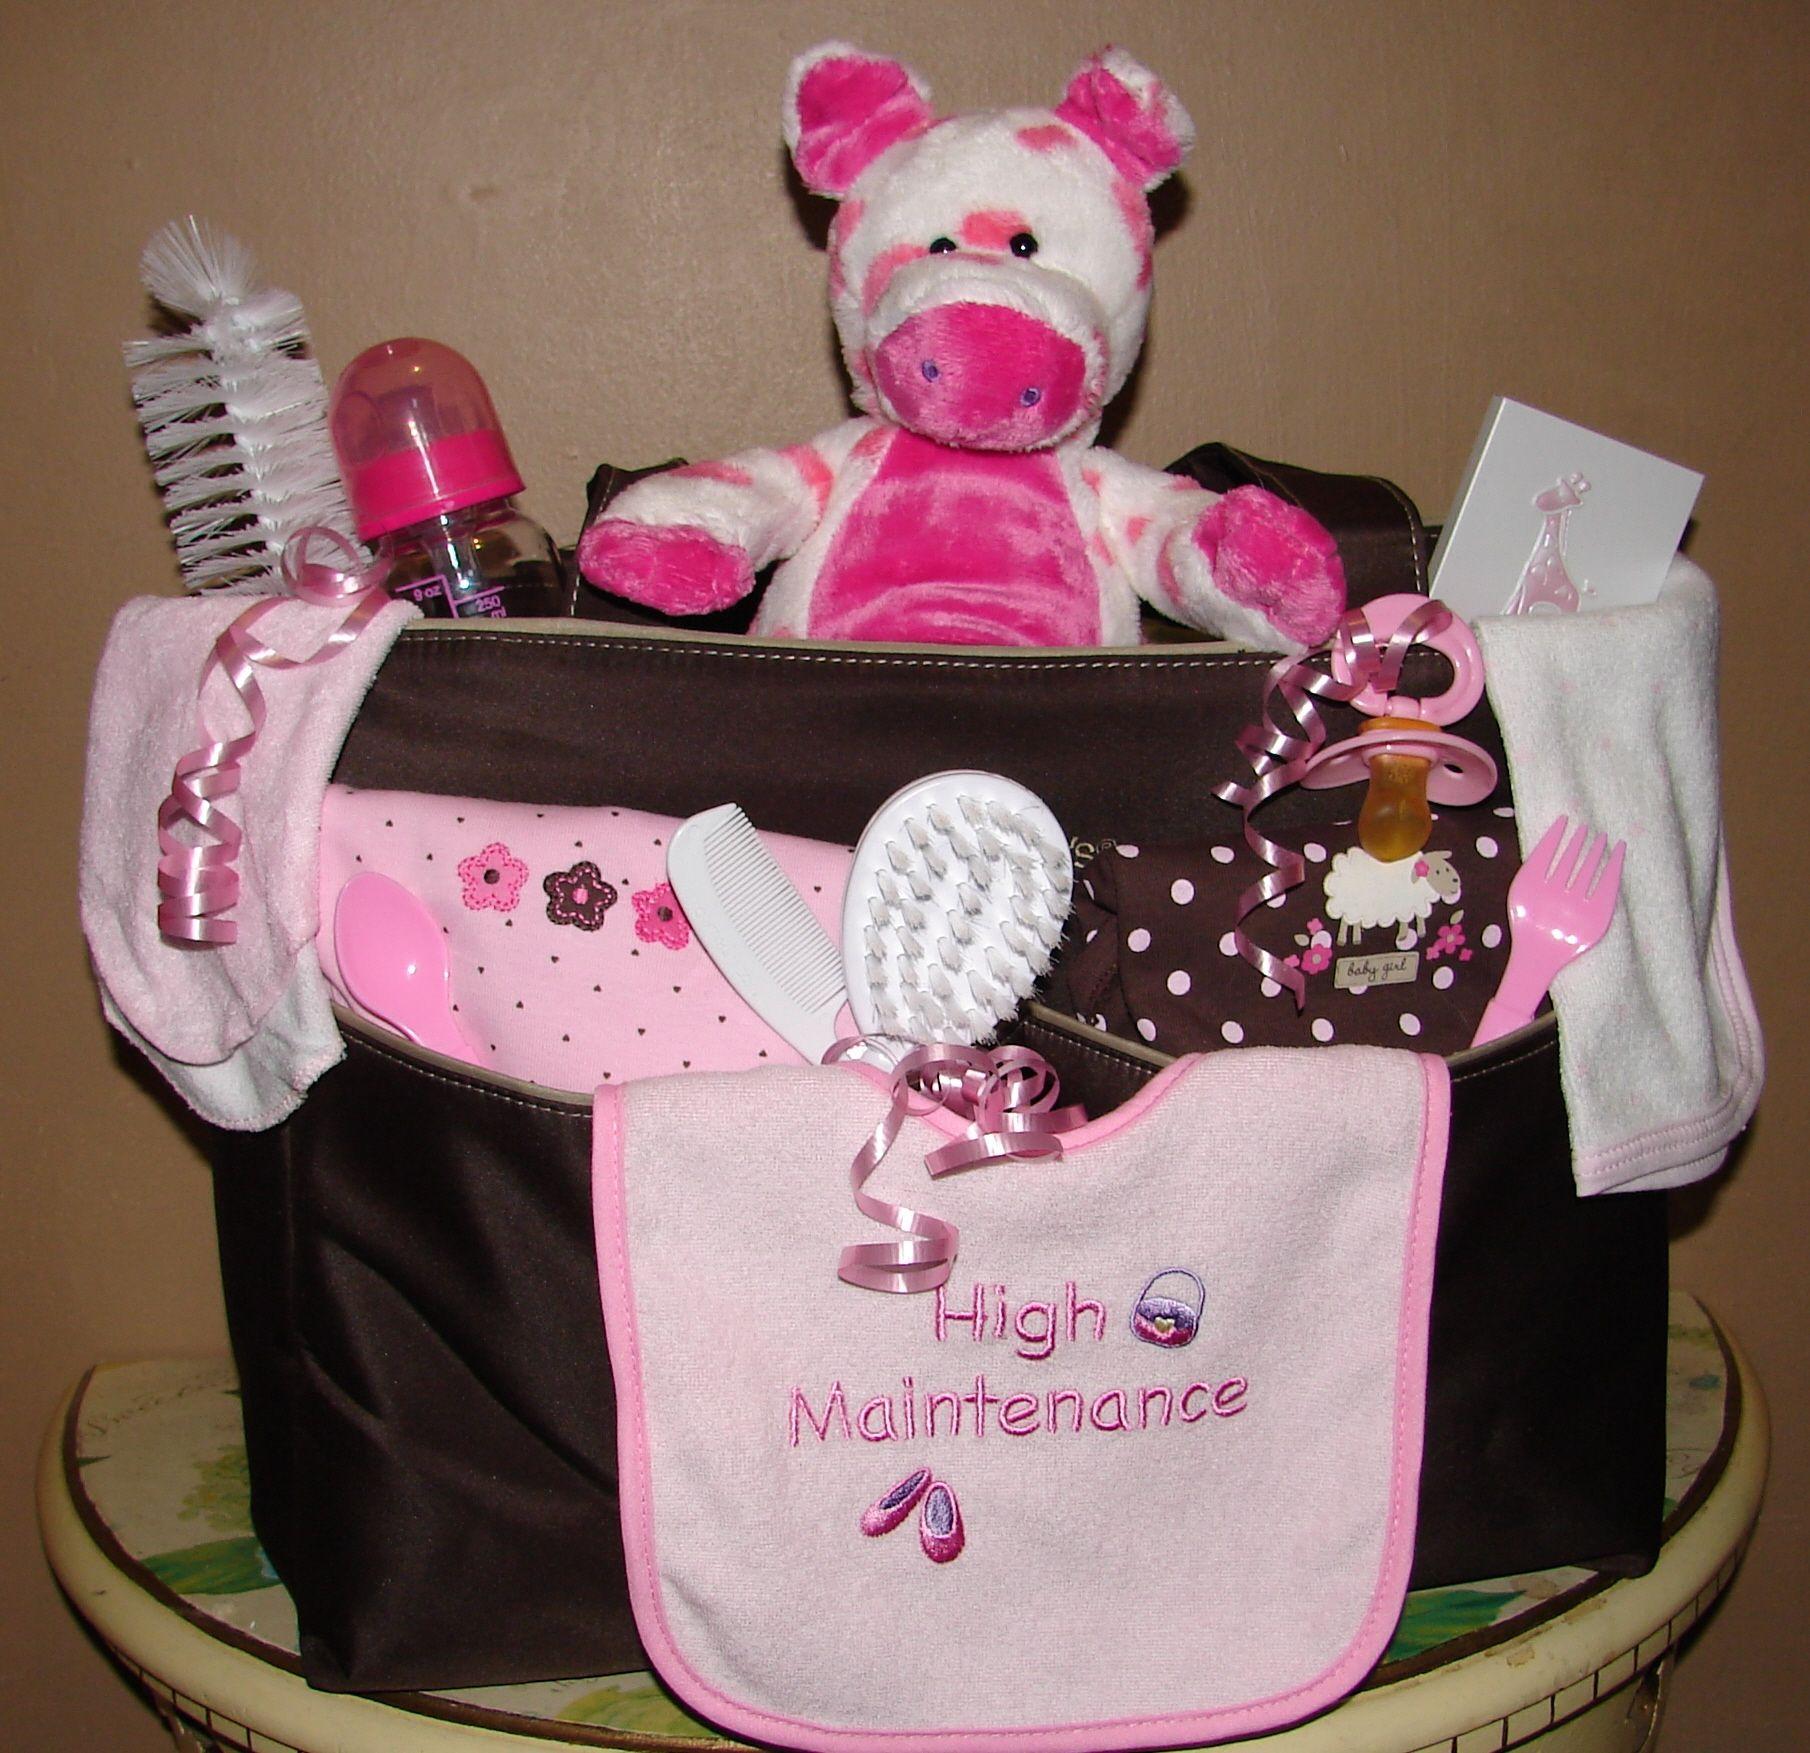 diaper bag gift set | AWESOME CREATIVE IDEAS! | Pinterest | Diaper ...